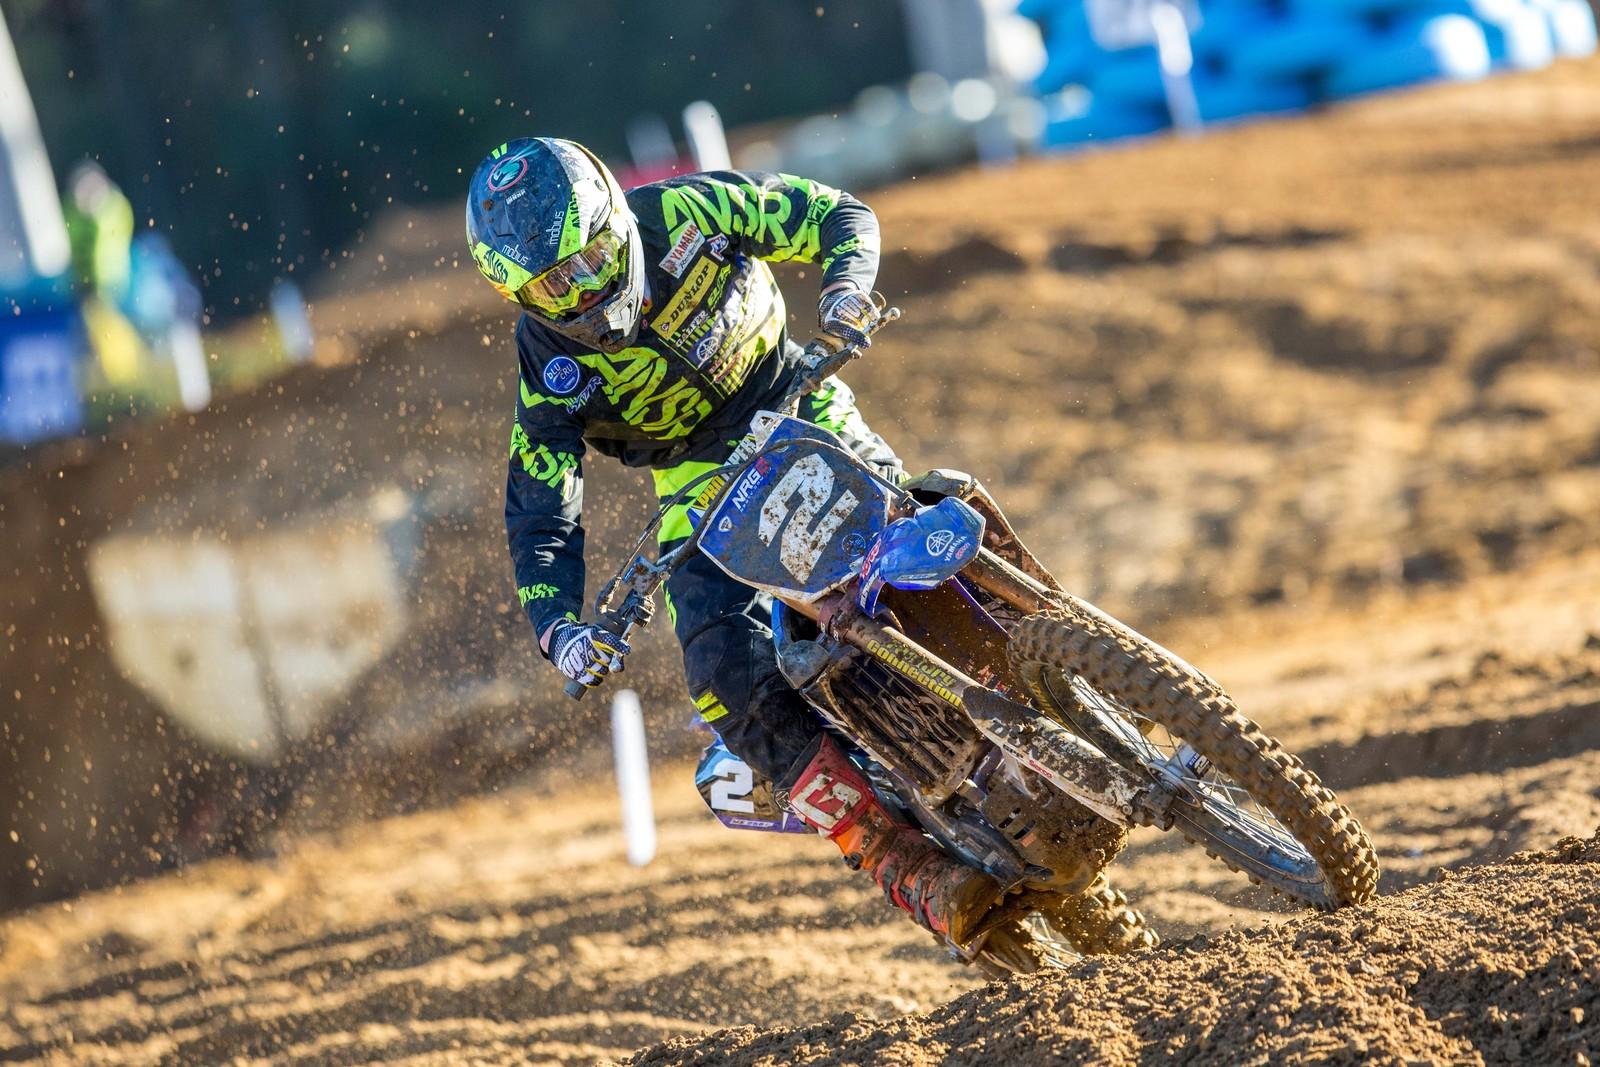 Wilson Todd - Australian Motul MX Championships: Round 6, Nowra - Motocross Pictures - Vital MX